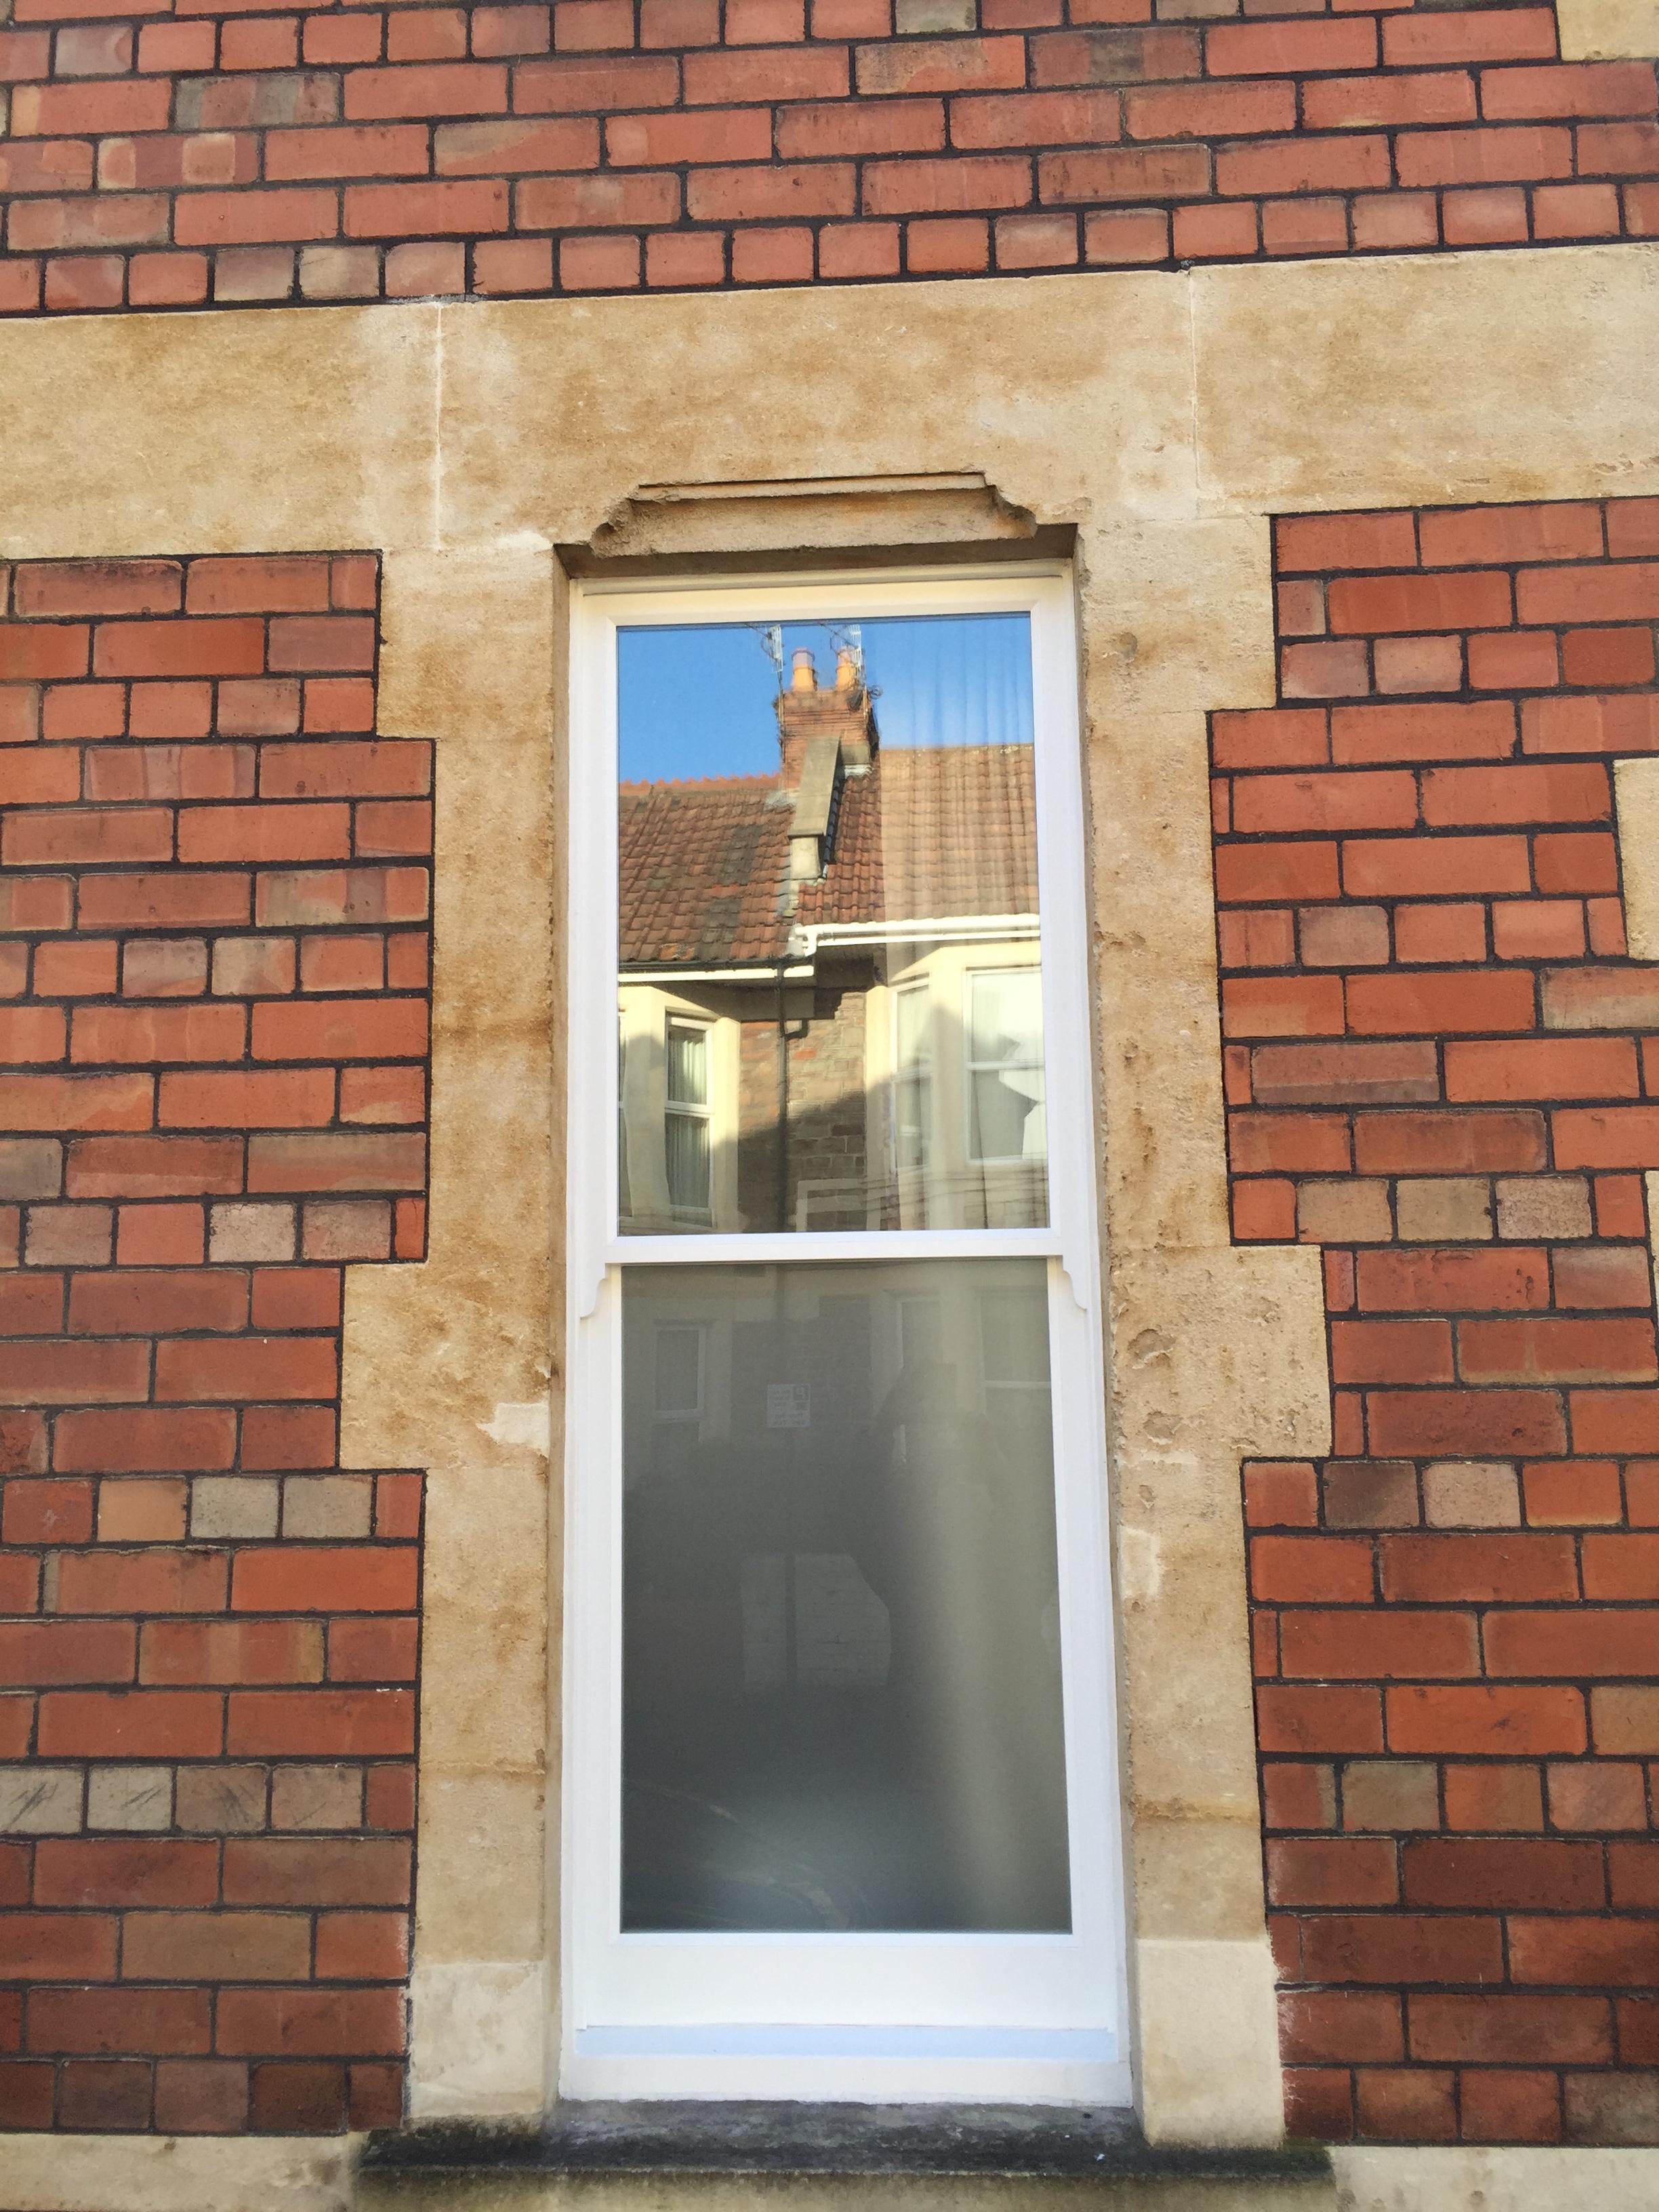 The bristol sash window company new bespoke accoya for The new window company